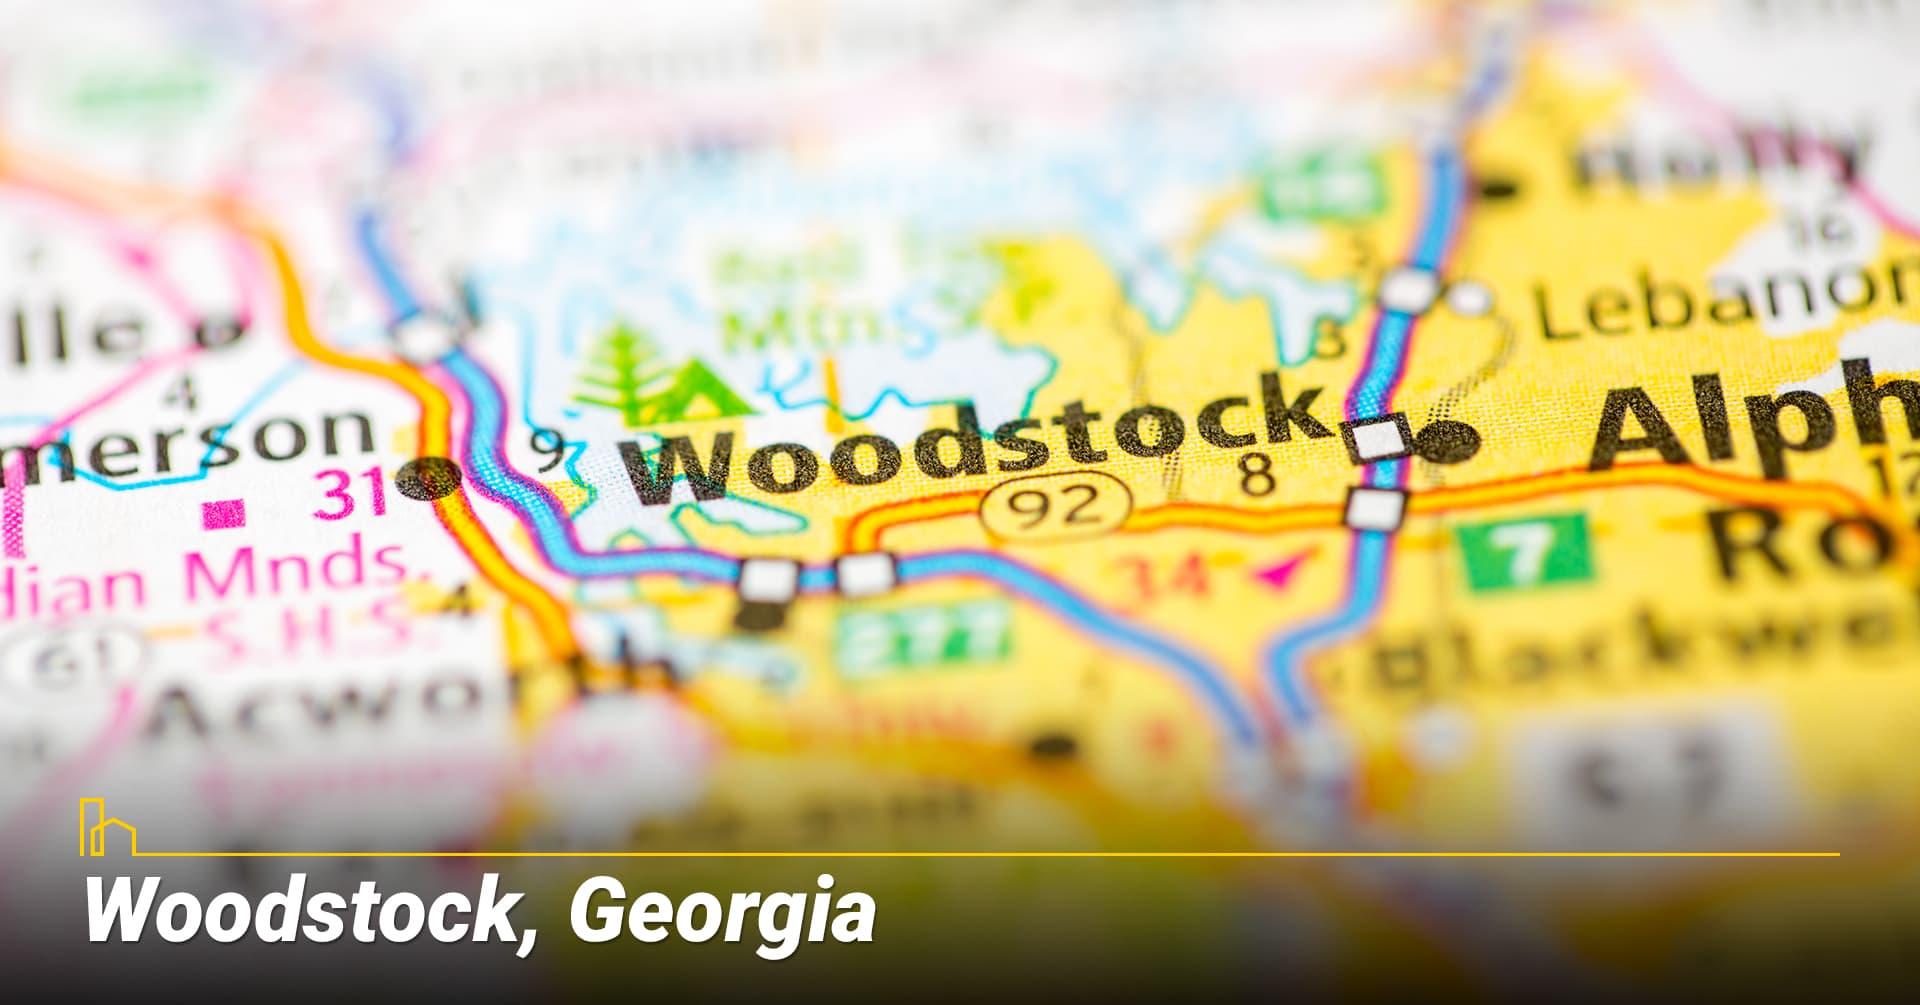 Woodstock, Georgia